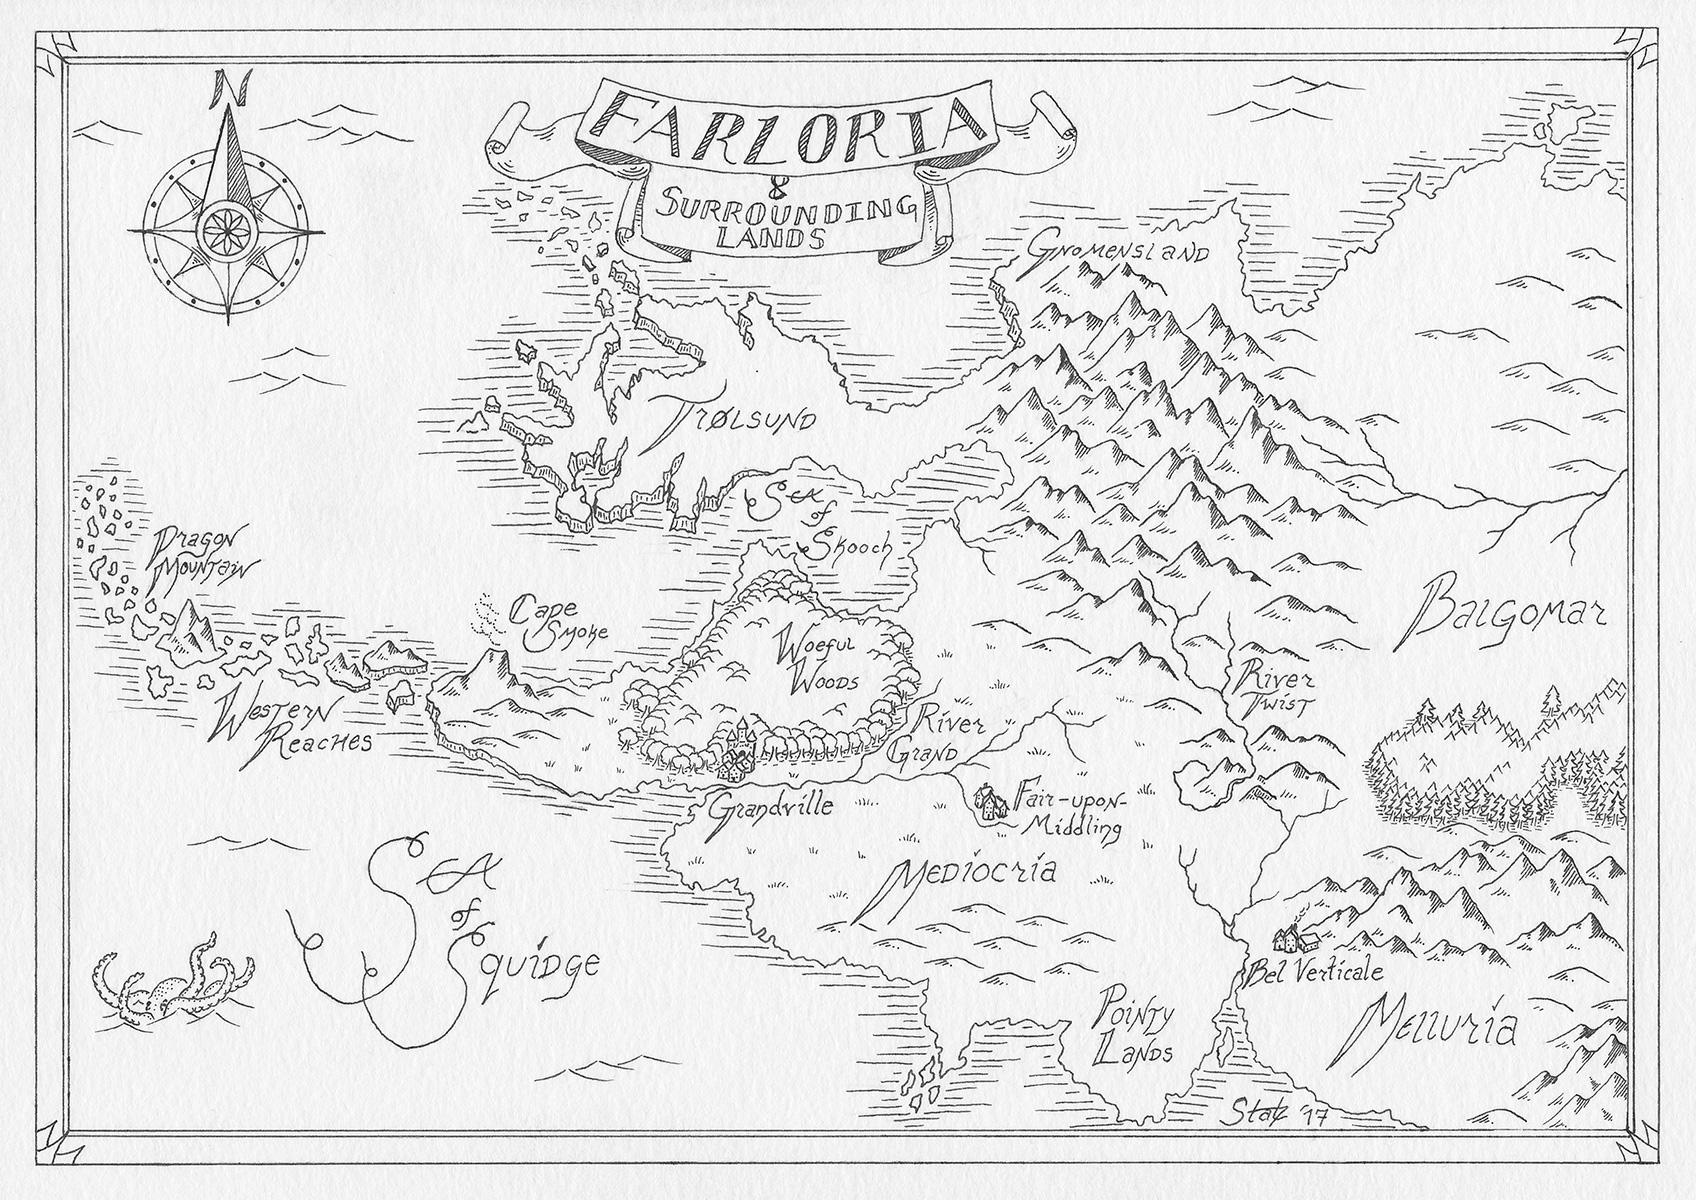 Map of Farloria